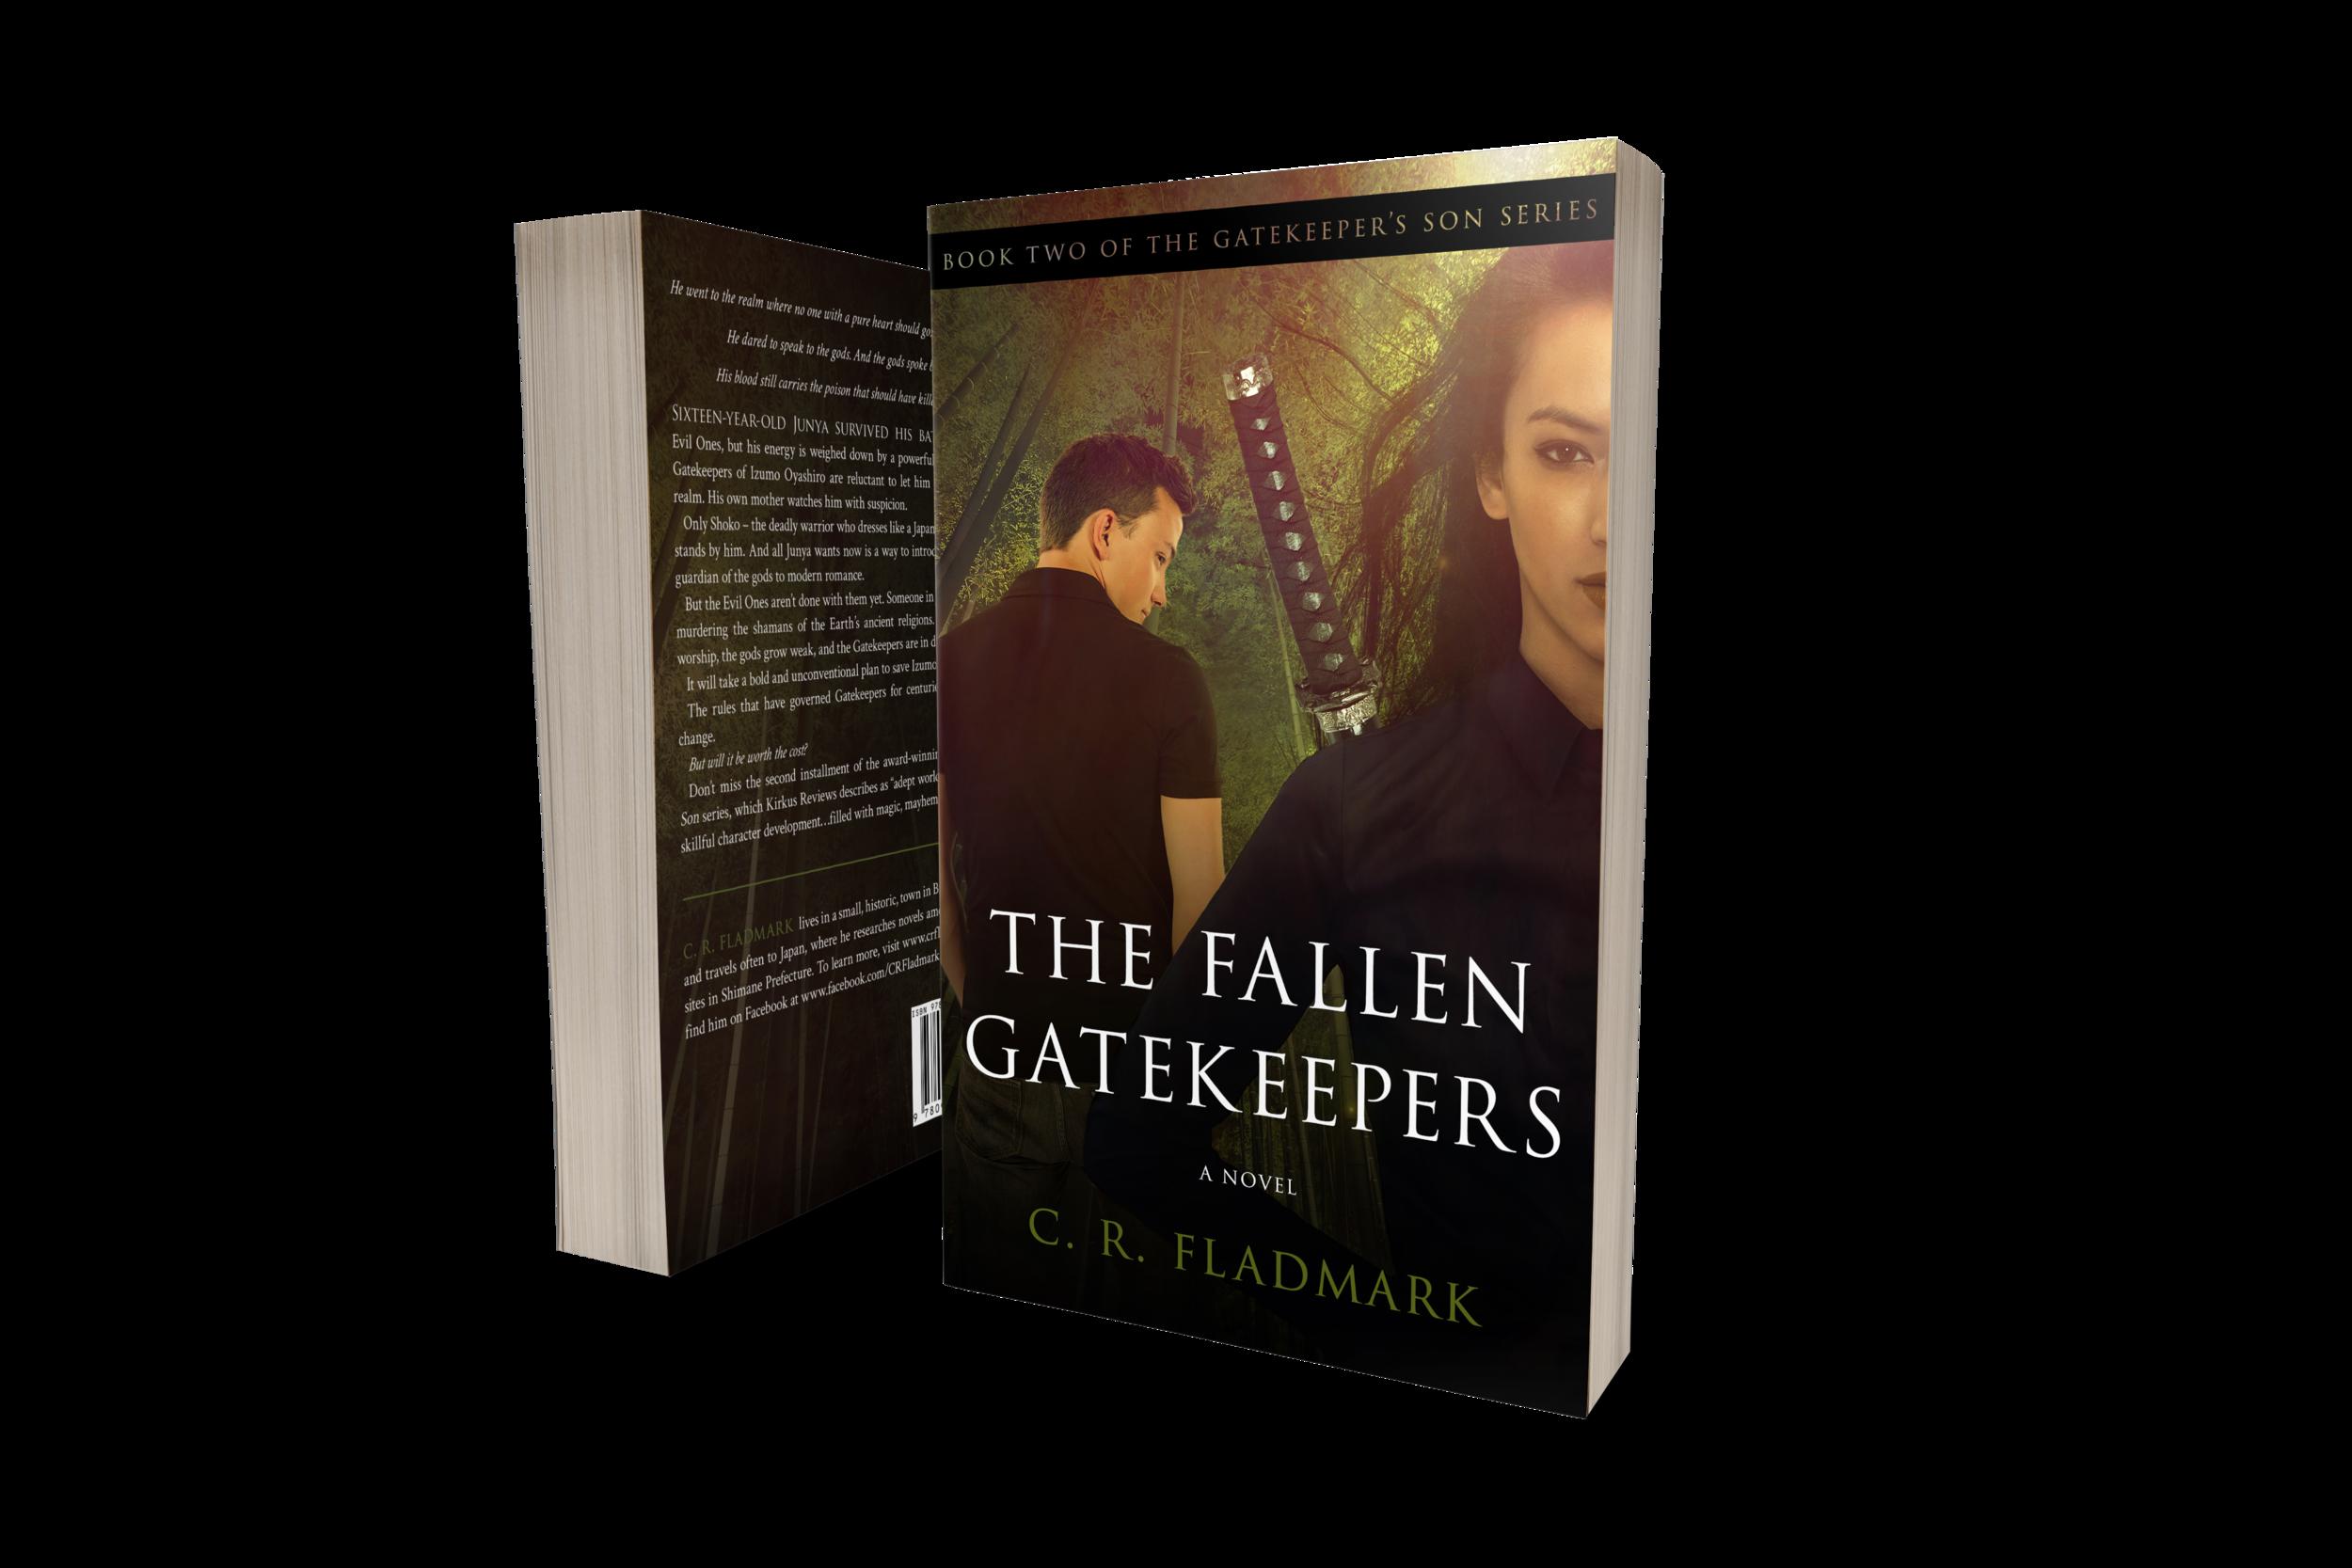 C. R. Fladmark's The Fallen Gatekeepers || Designed by TheThatchery.com